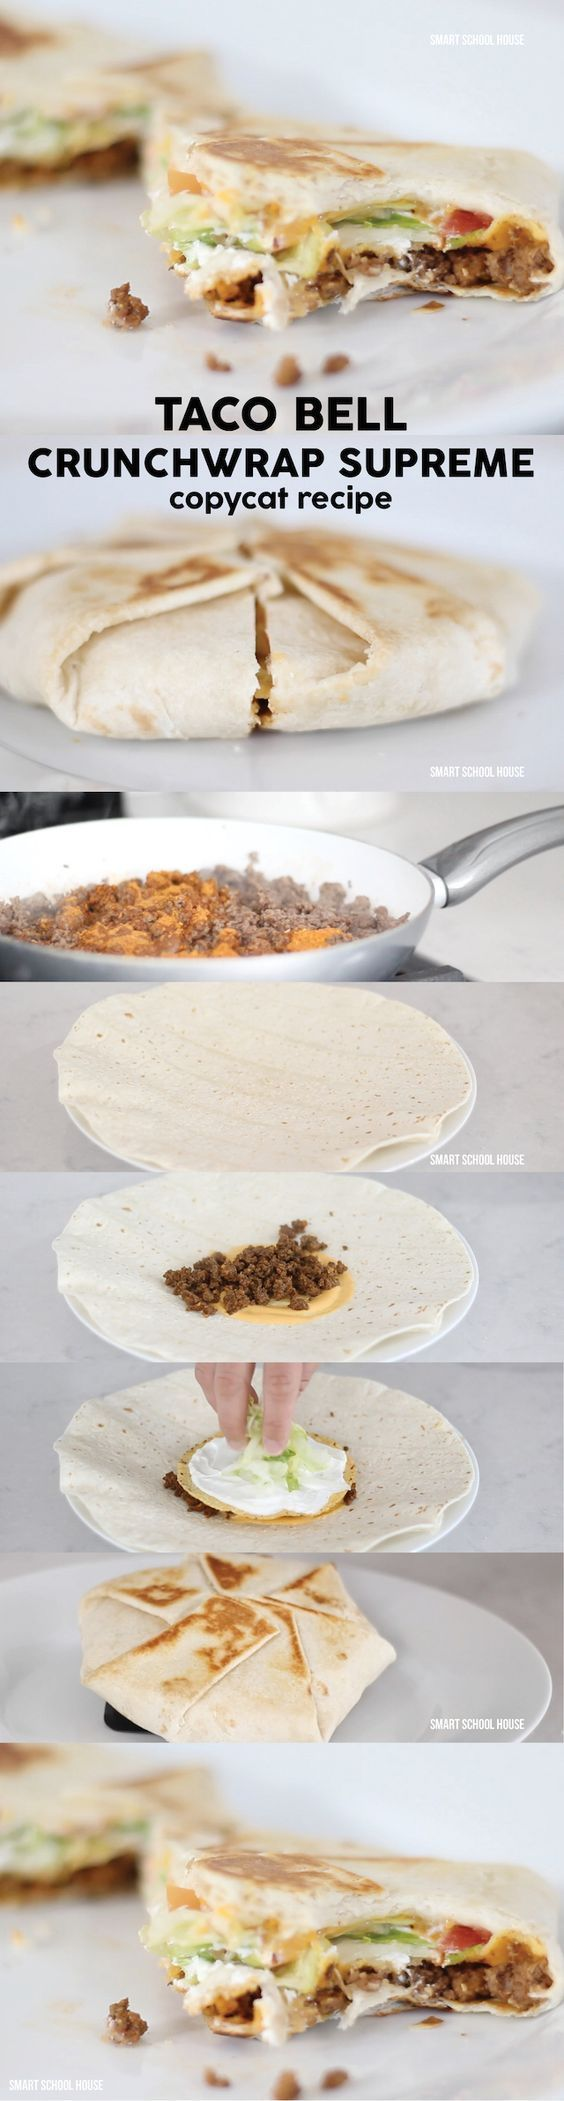 Taco Bell Crunch Wrap Supreme Recipe